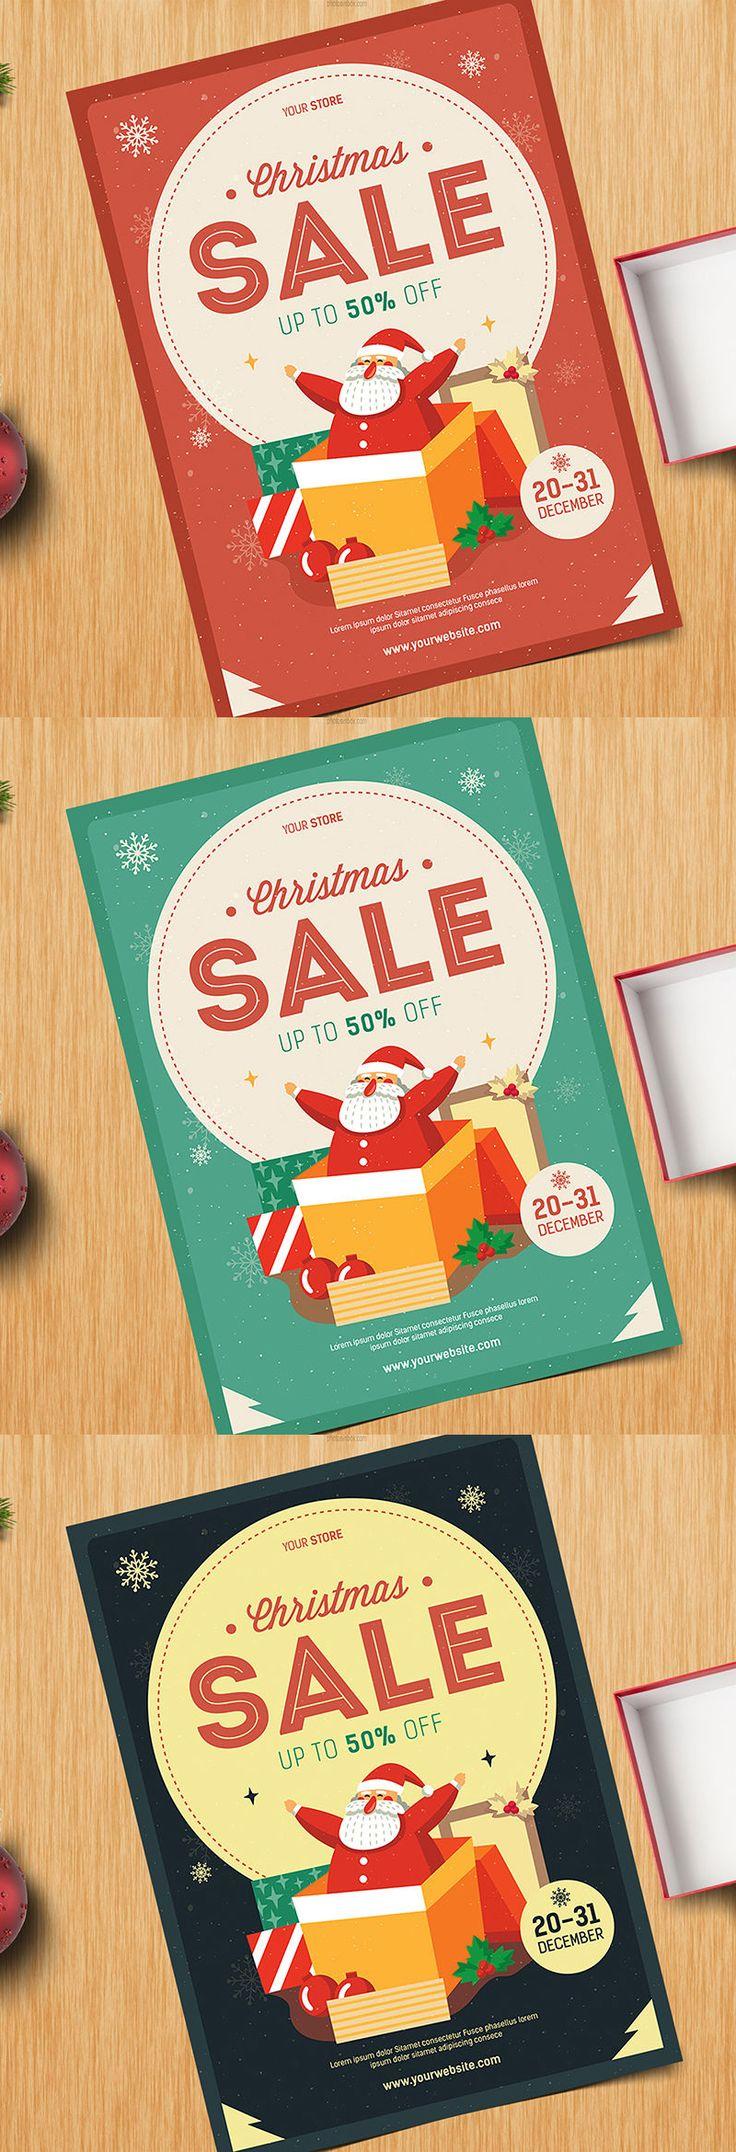 Christmas Sale Flyer Template AI, PSD